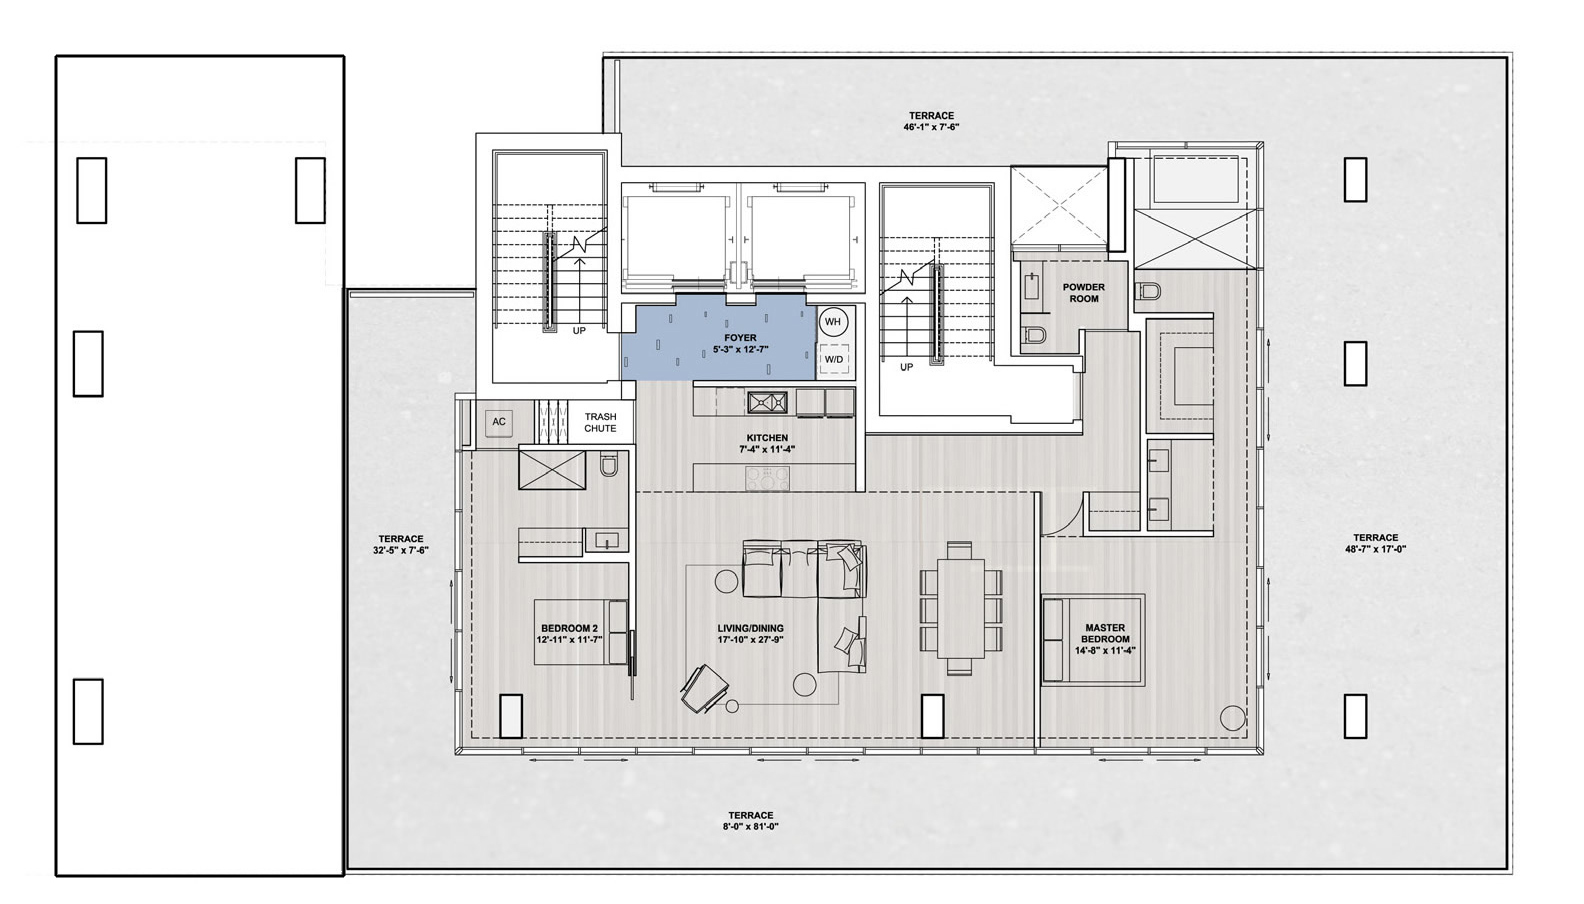 Floors 6 - 7